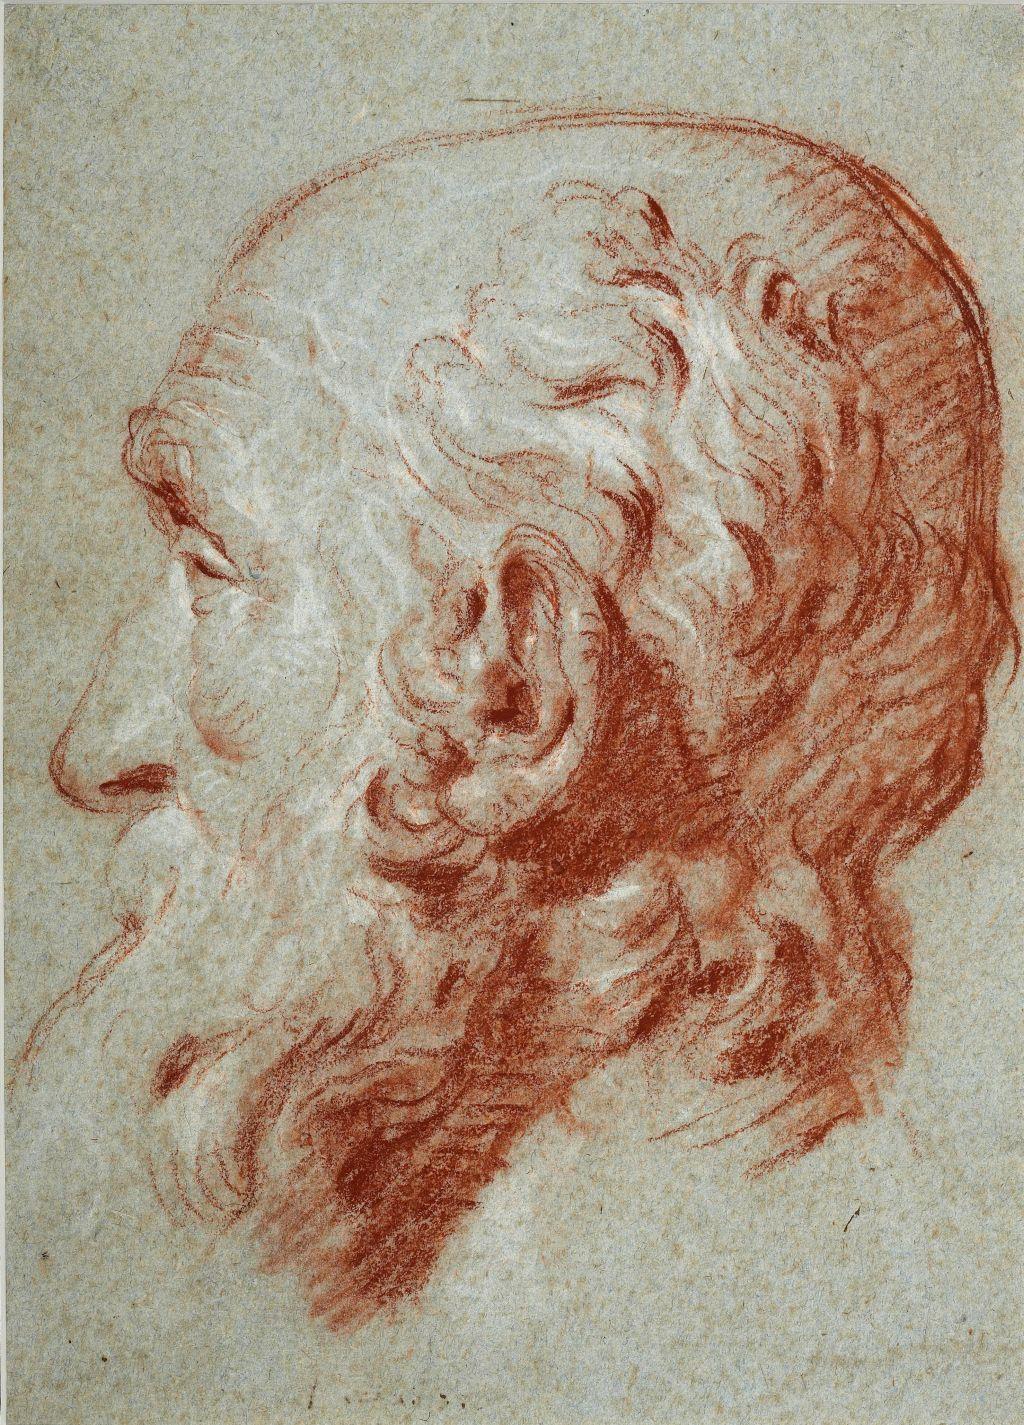 Cap de Giulio Contarini, després de Alessandro Vittoria, Giovanni Battista Tiepolo